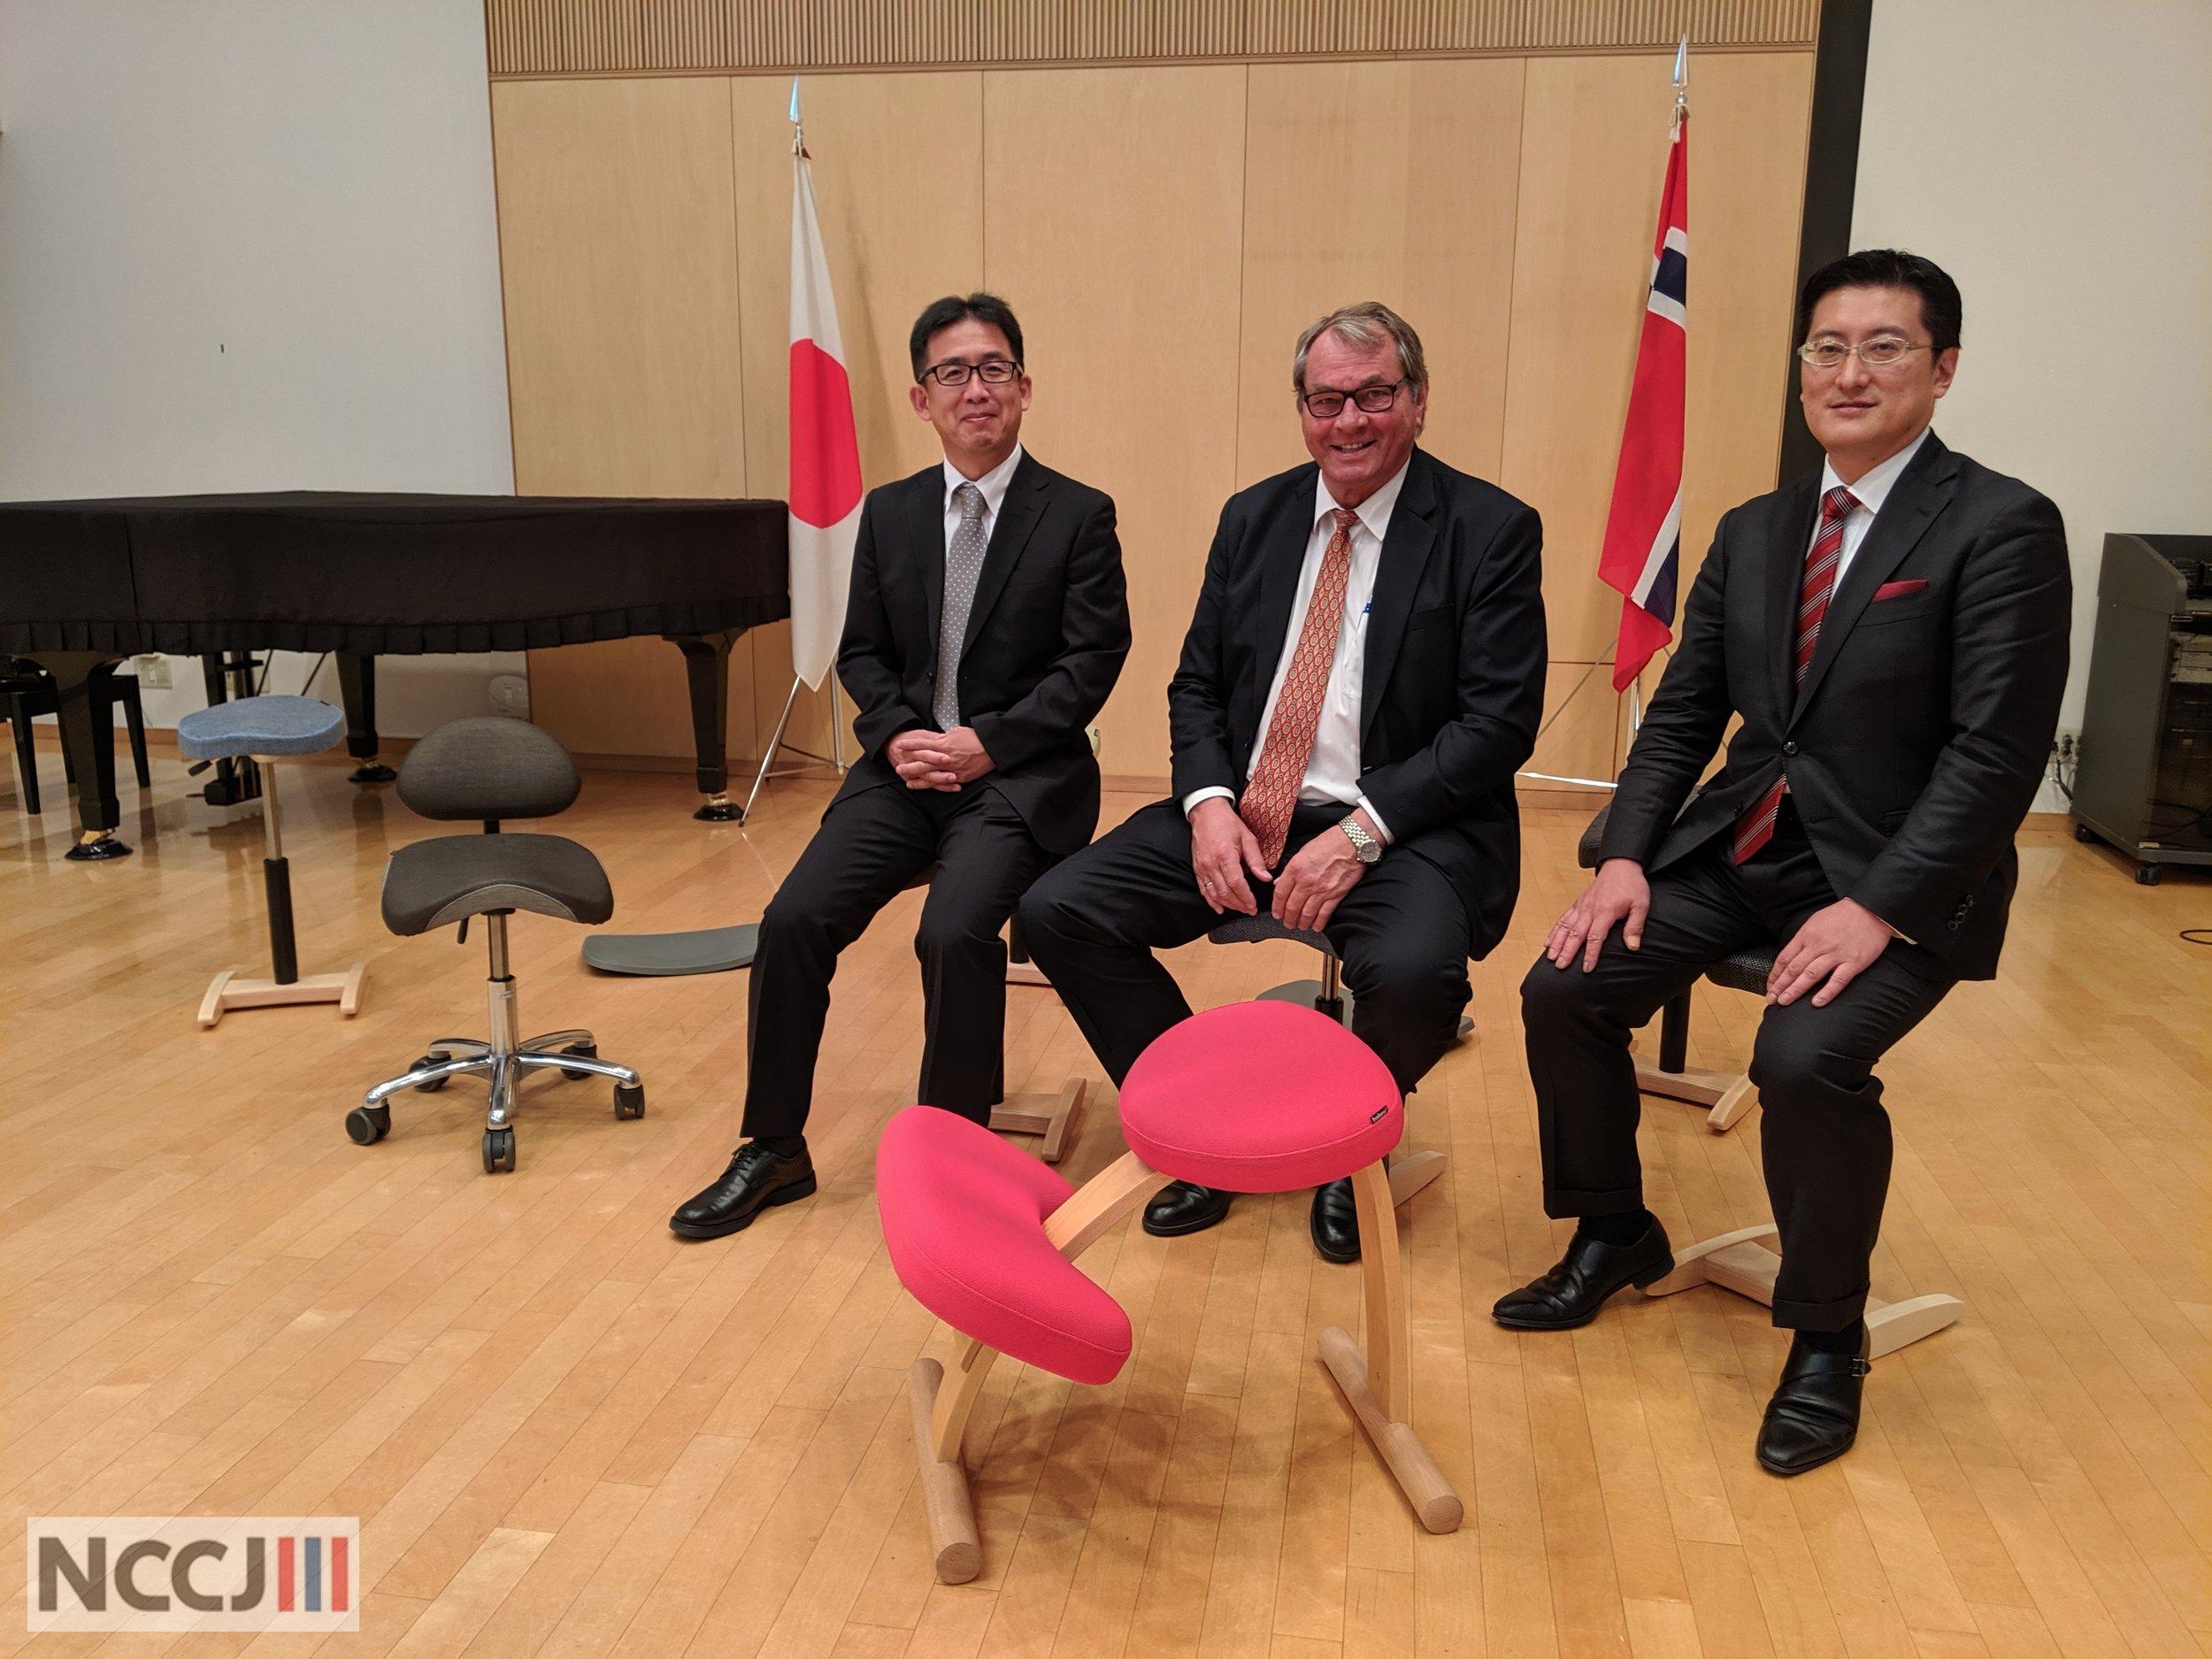 From left: Mr. Muraki Satoshi, Mr. Hans Christian Mengshoel and Mr. Tohji Sakamoto